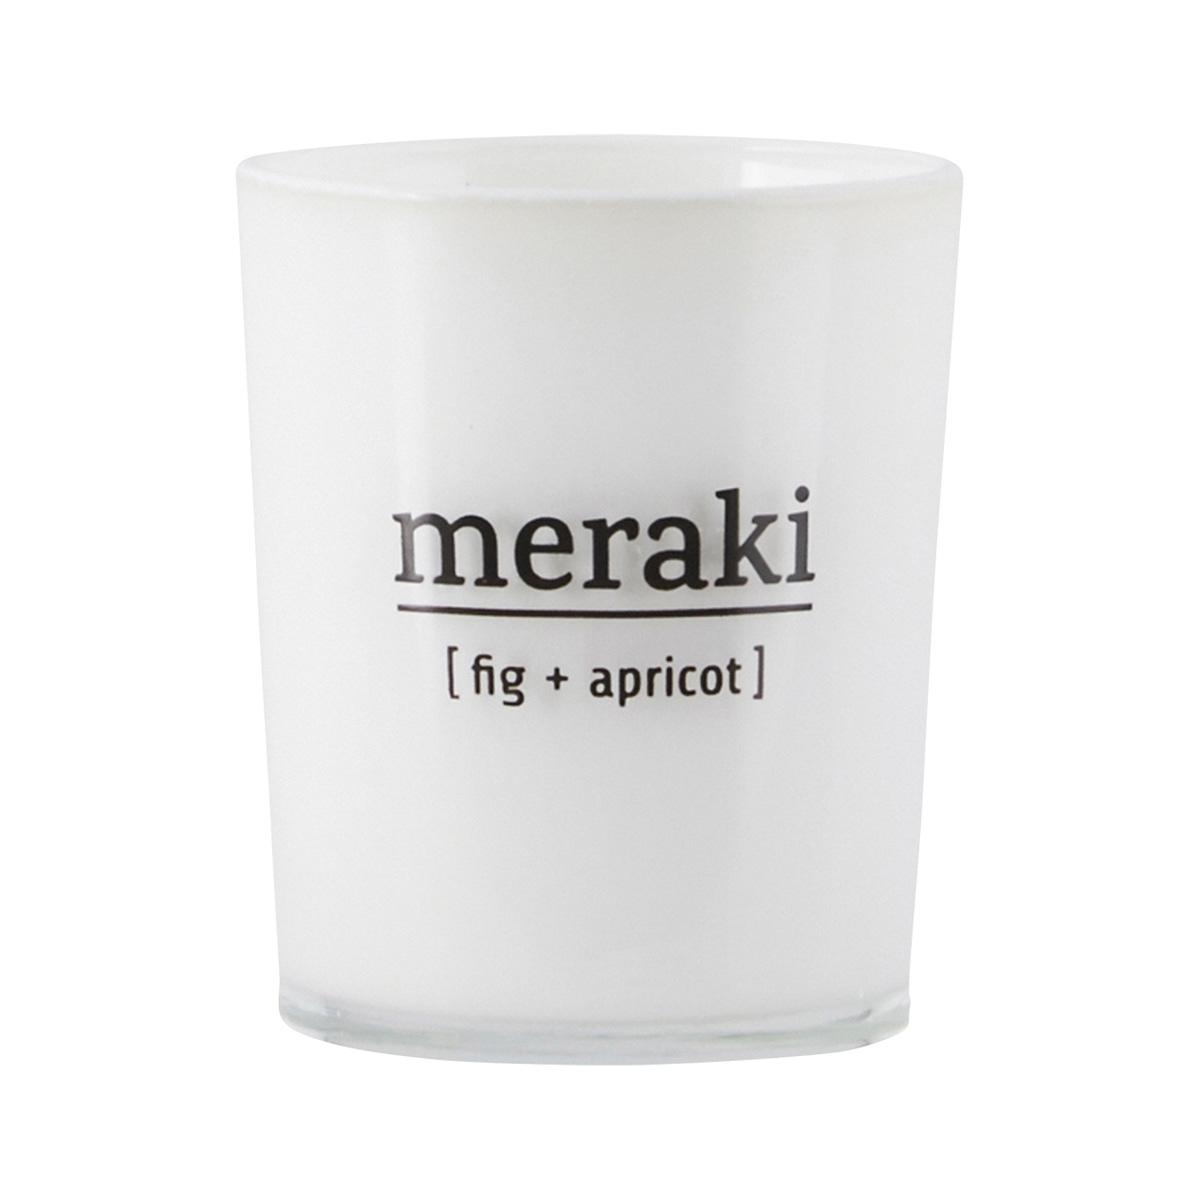 Meraki Candles